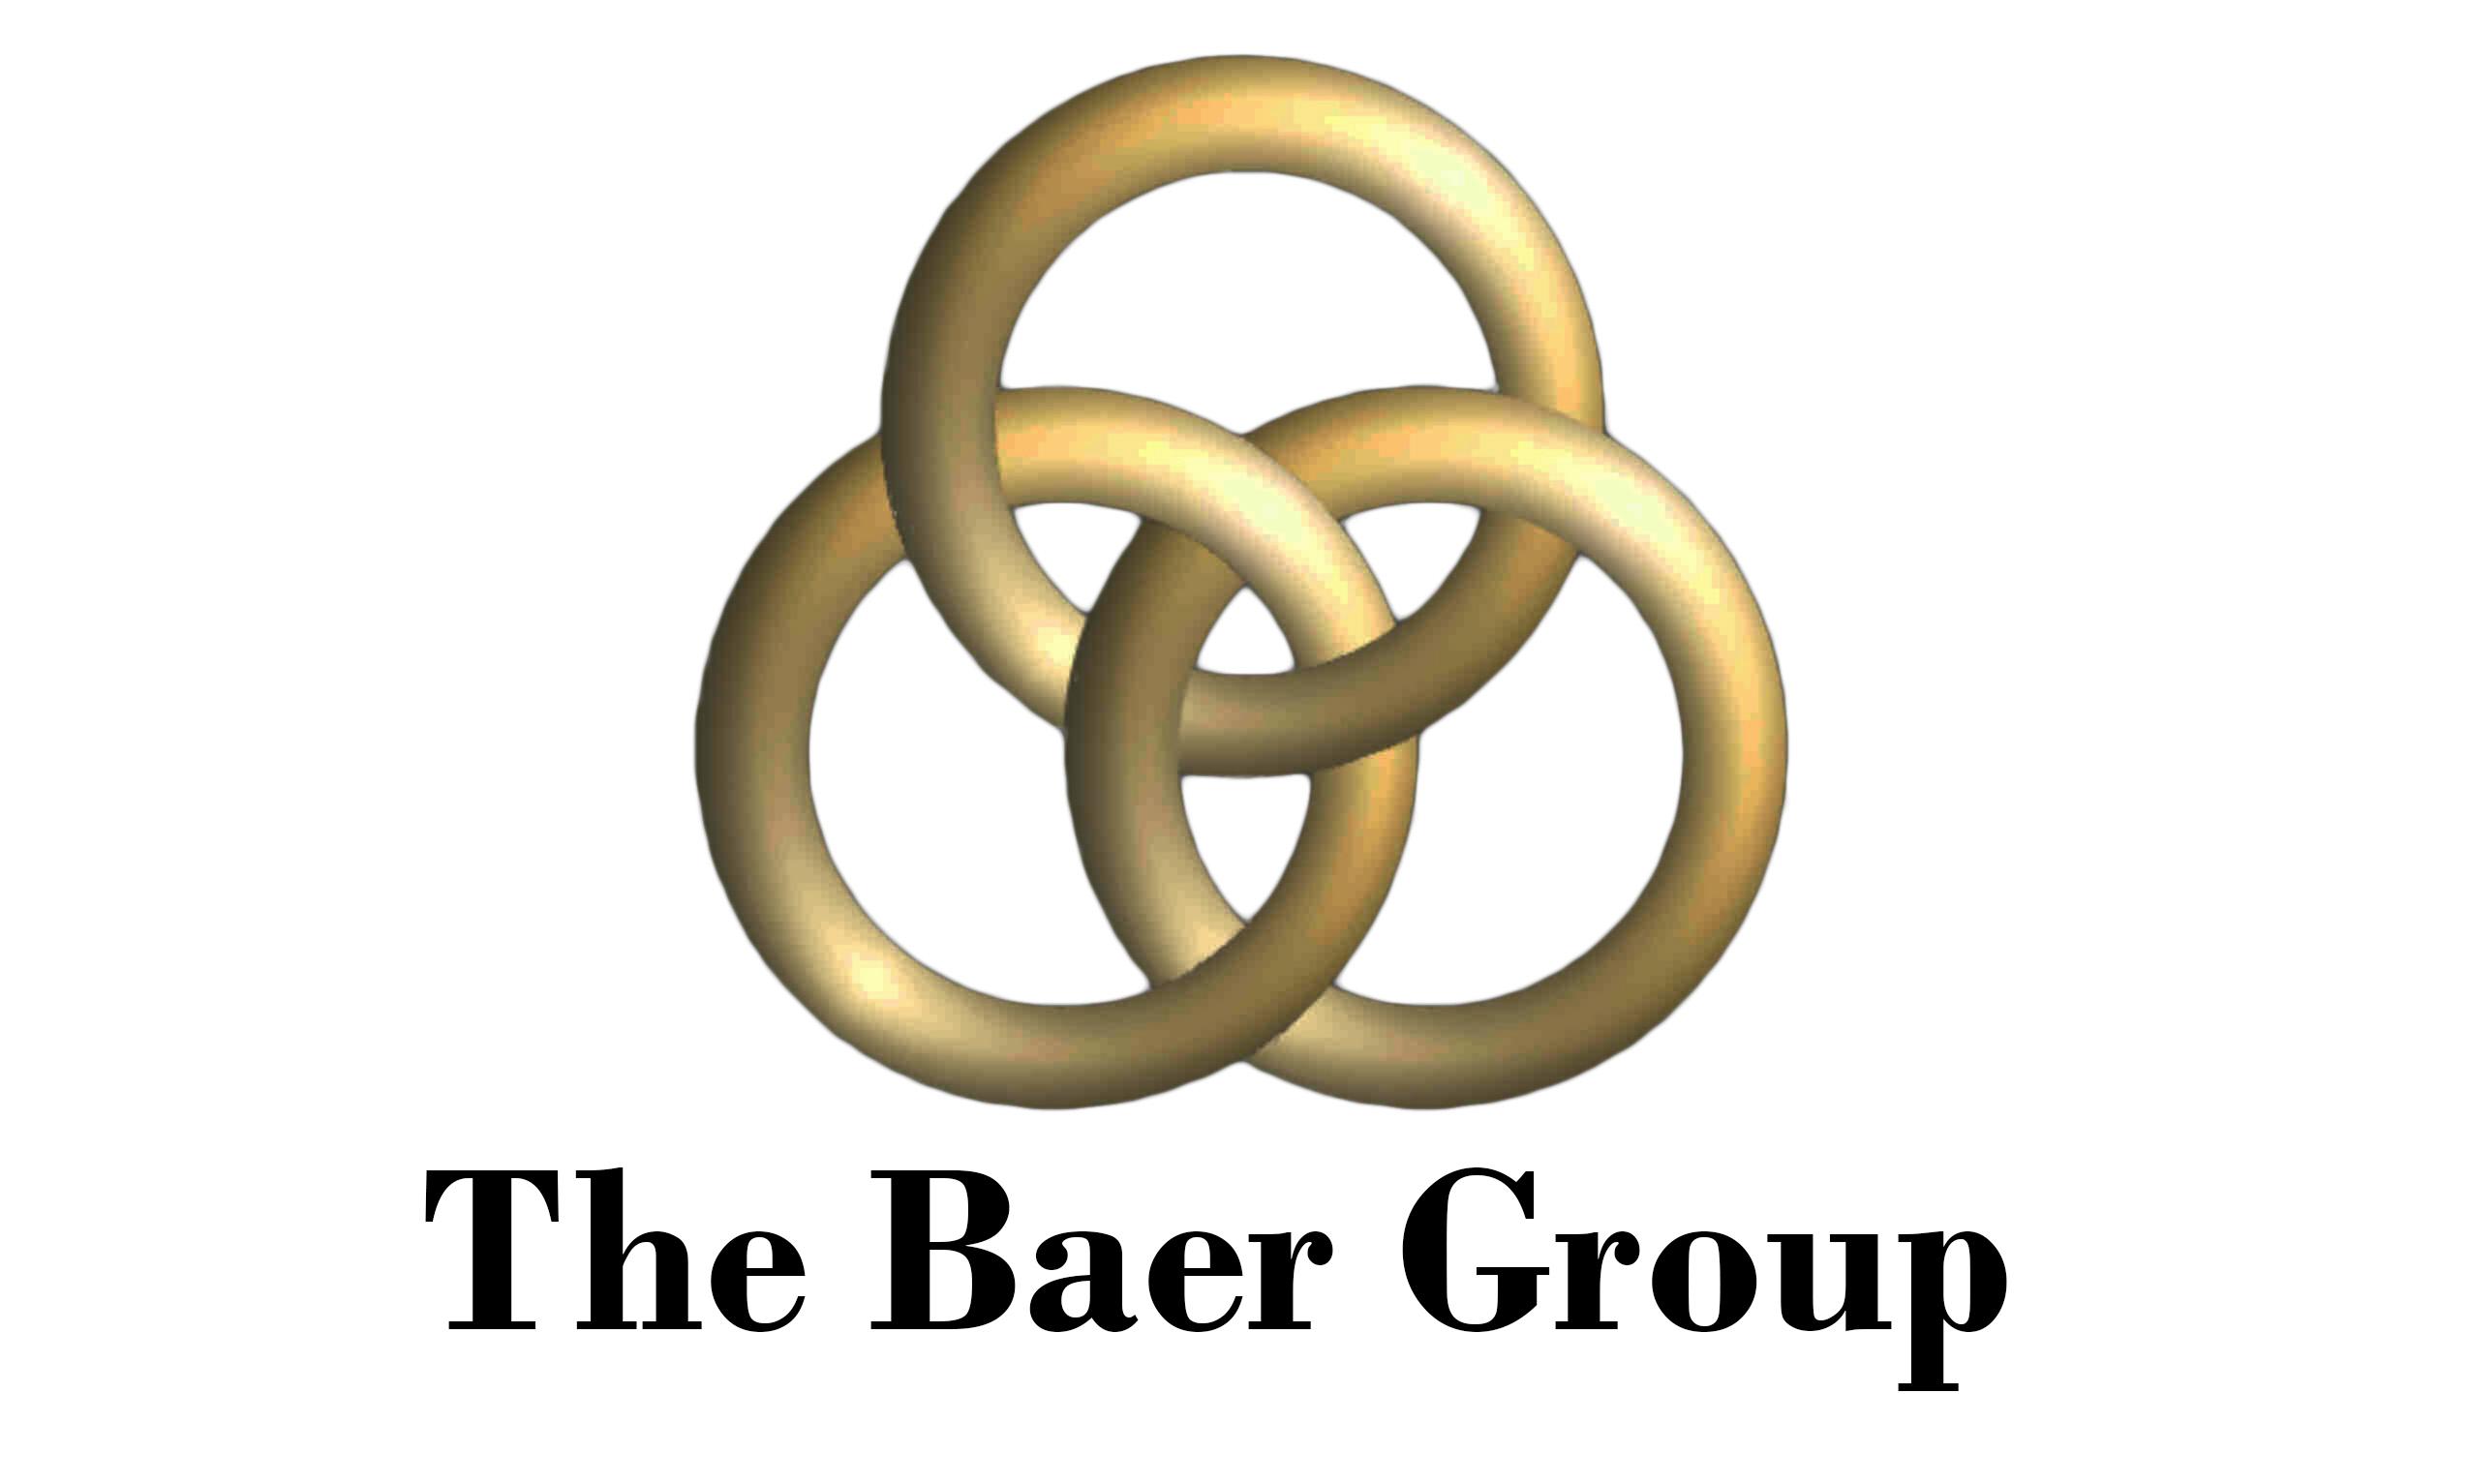 The Baer Group - Atlanta